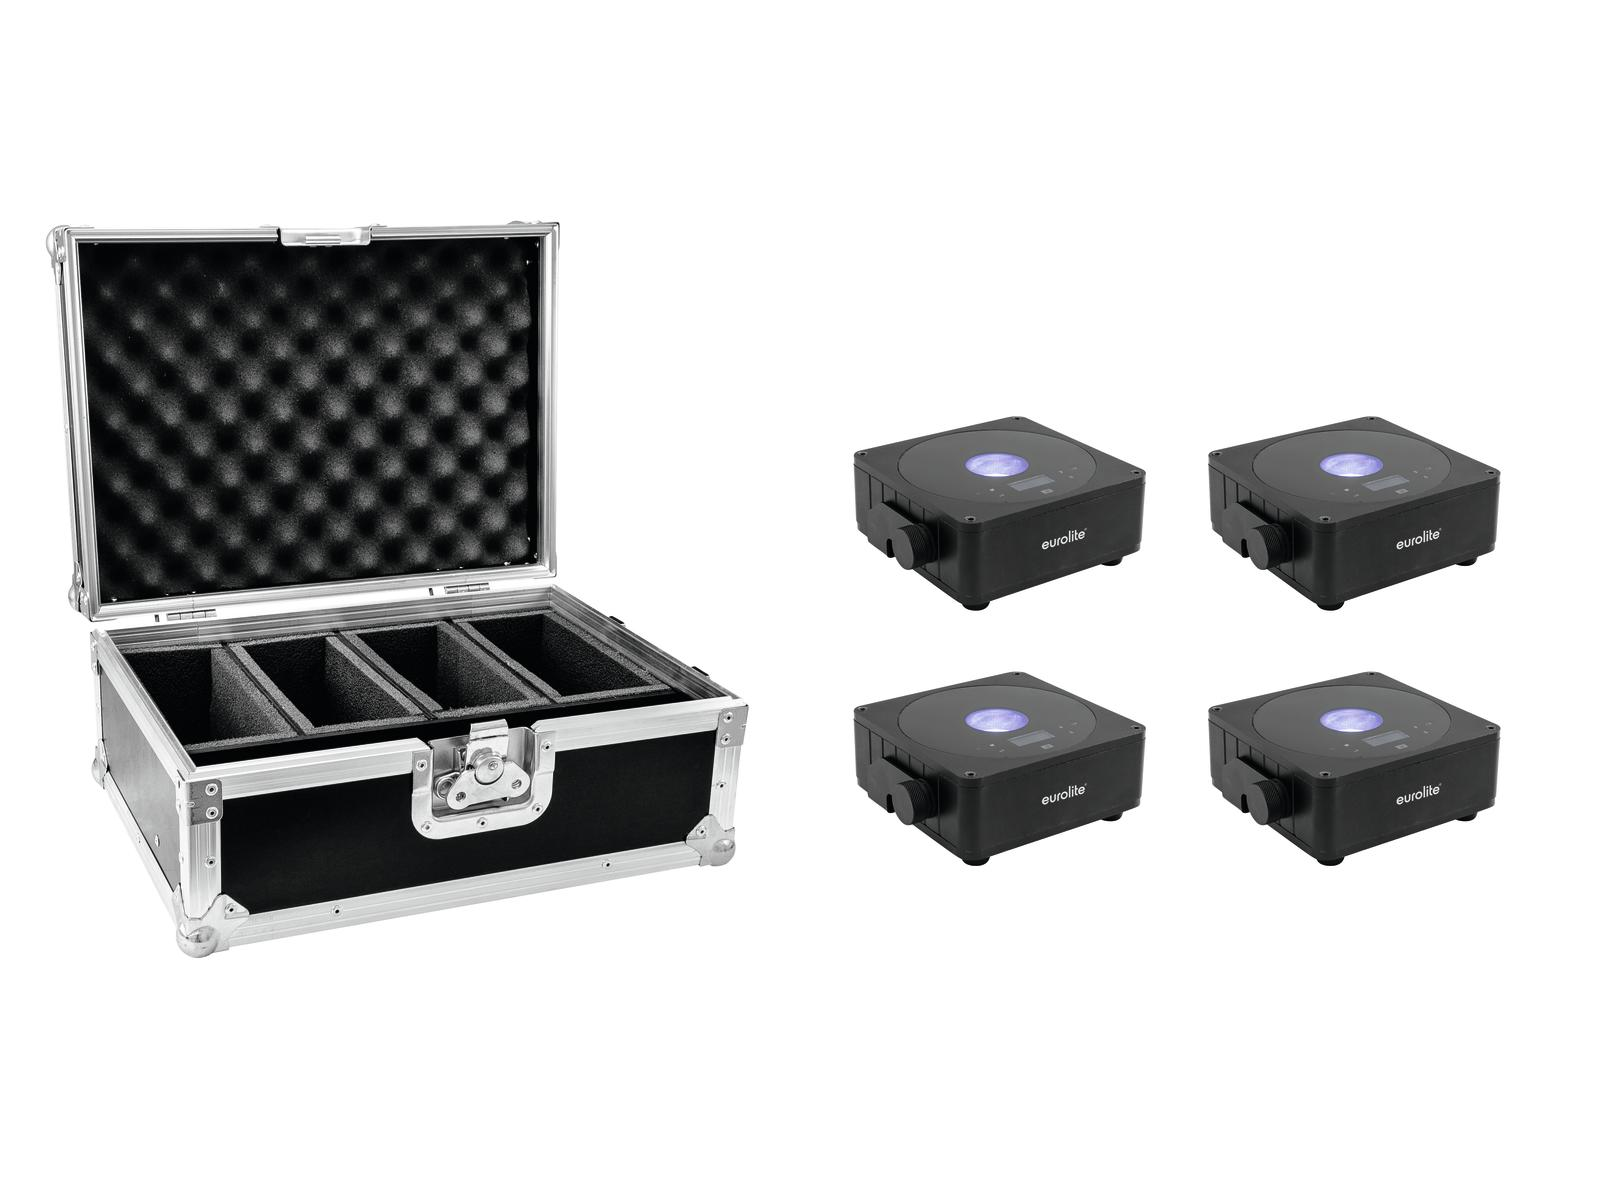 EUROLITE Set 4x AKKU Flat Light 1 schwarz + Case